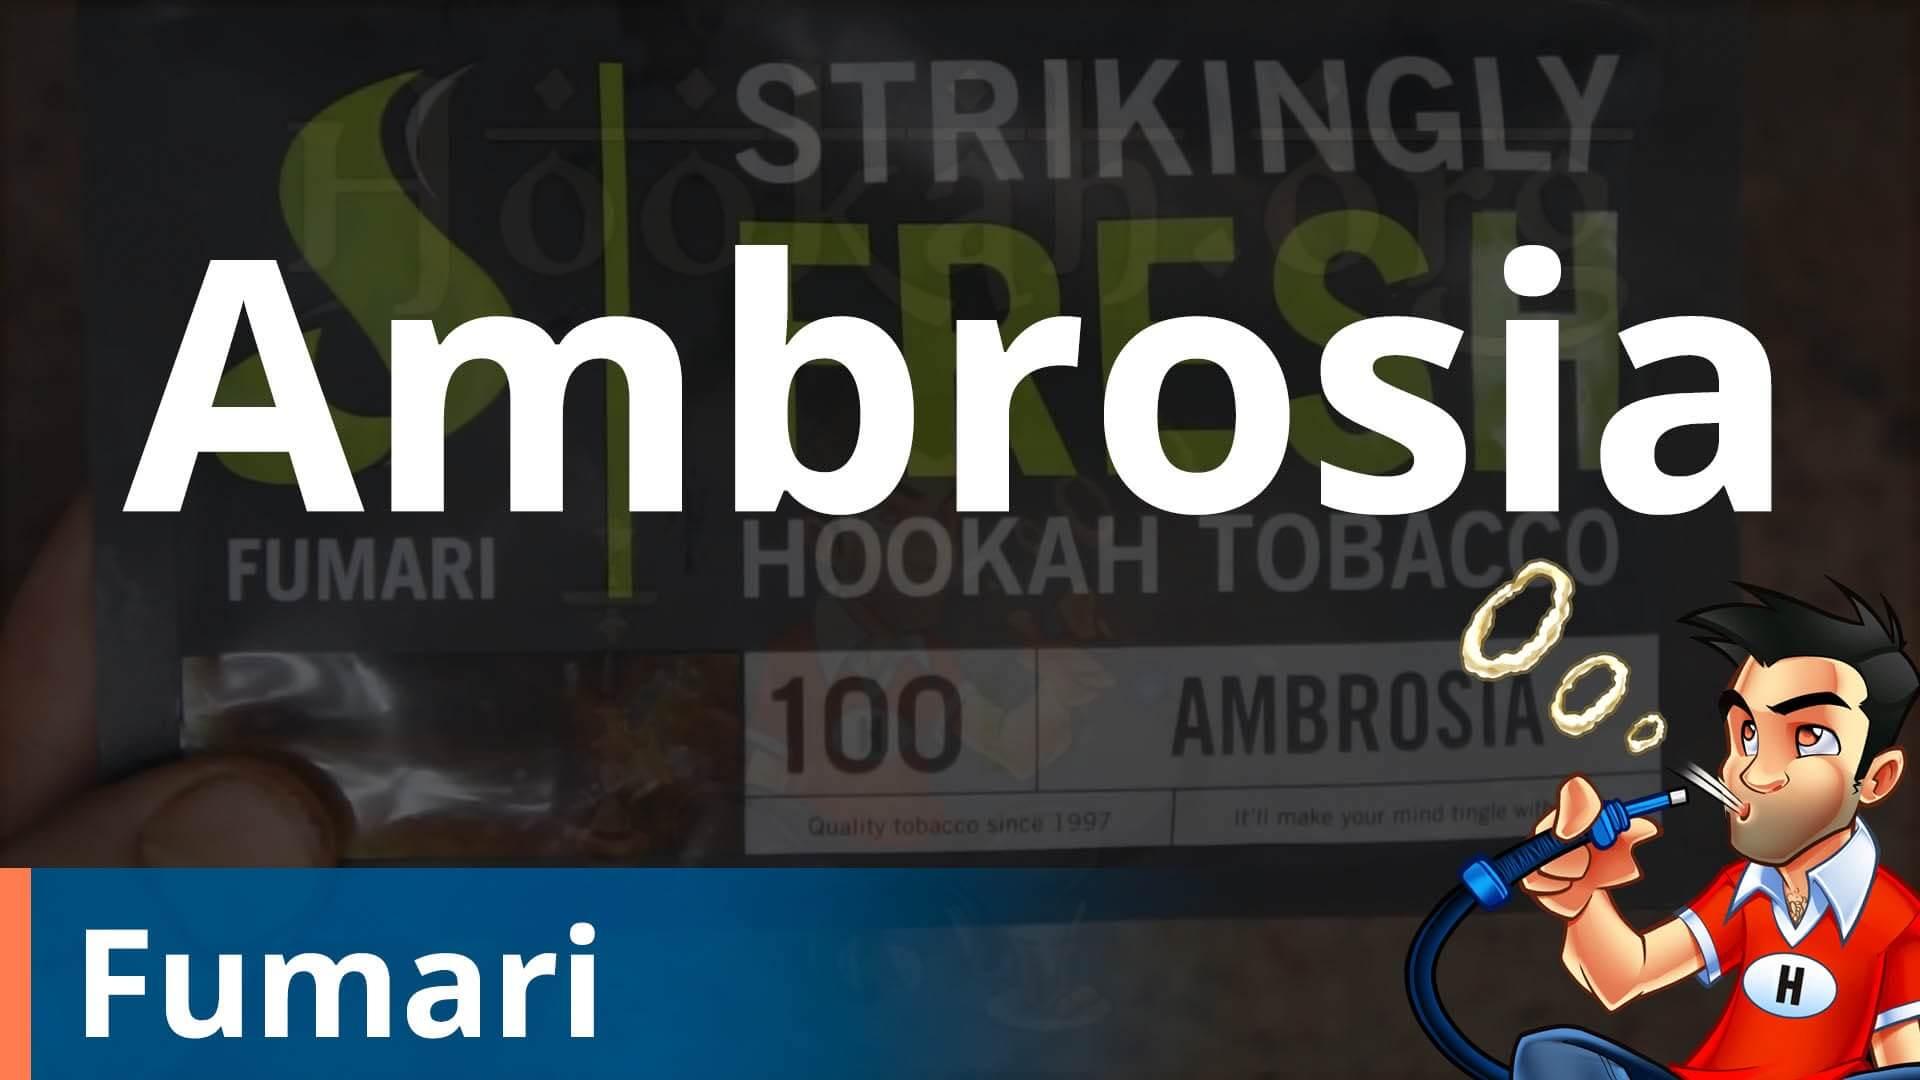 Fumari Ambrosia Shisha Review